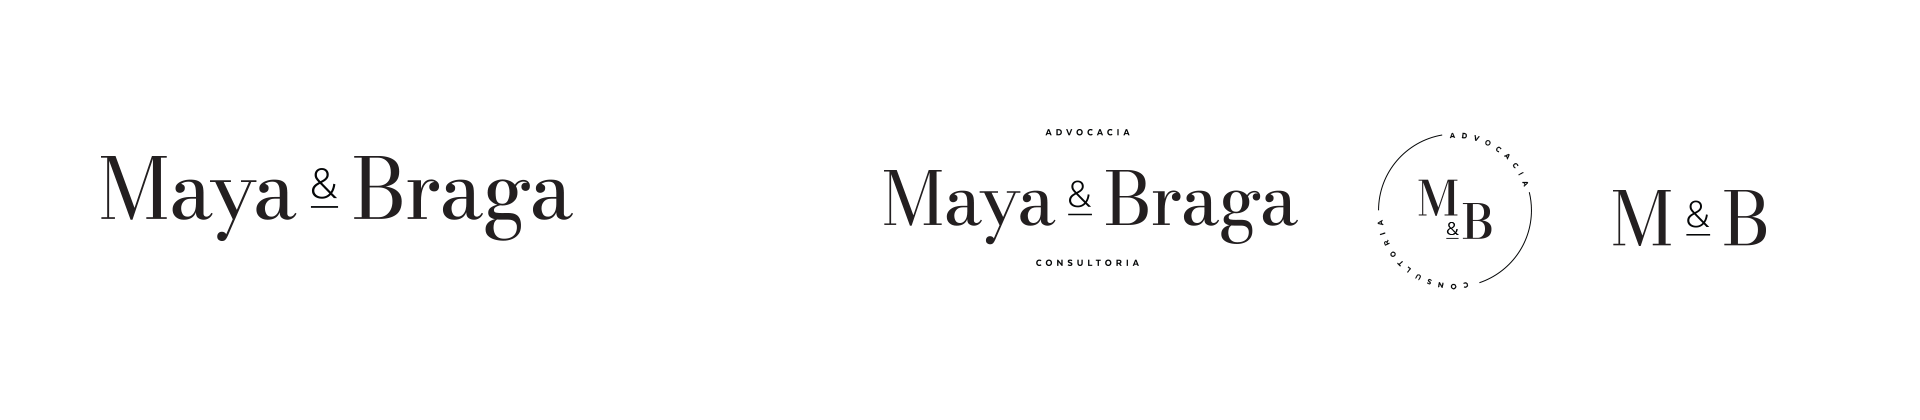 Maya e Braga logo versions